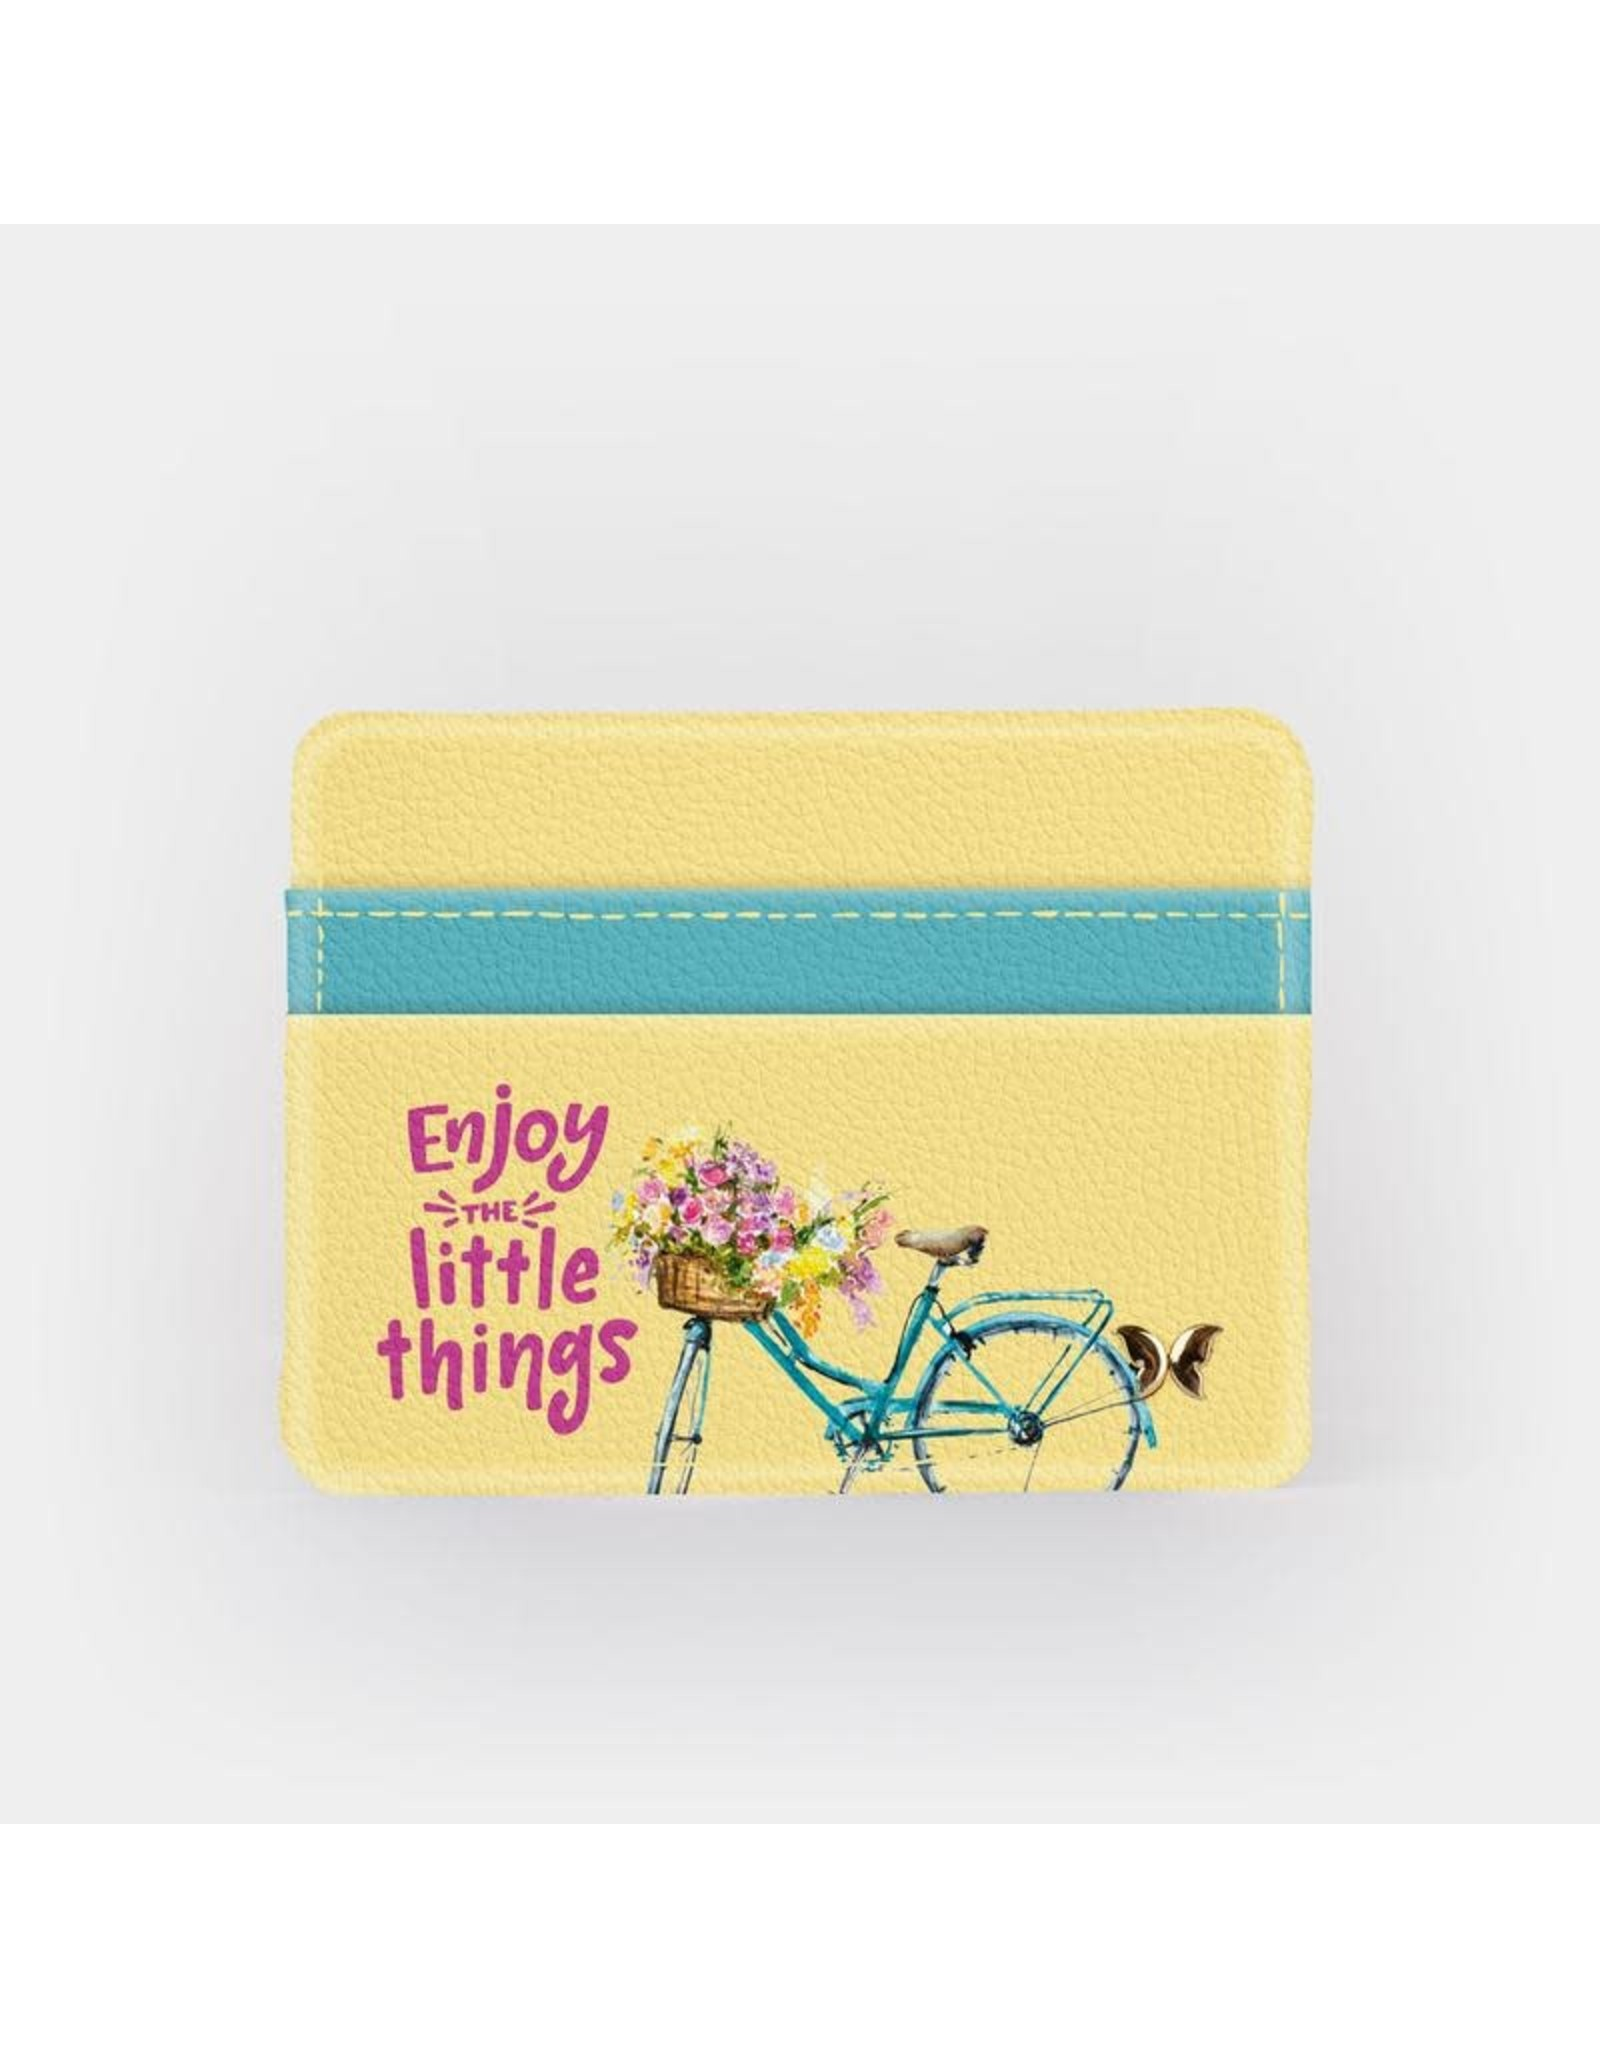 Monarque Slim Wallet - Enjoy Little Things